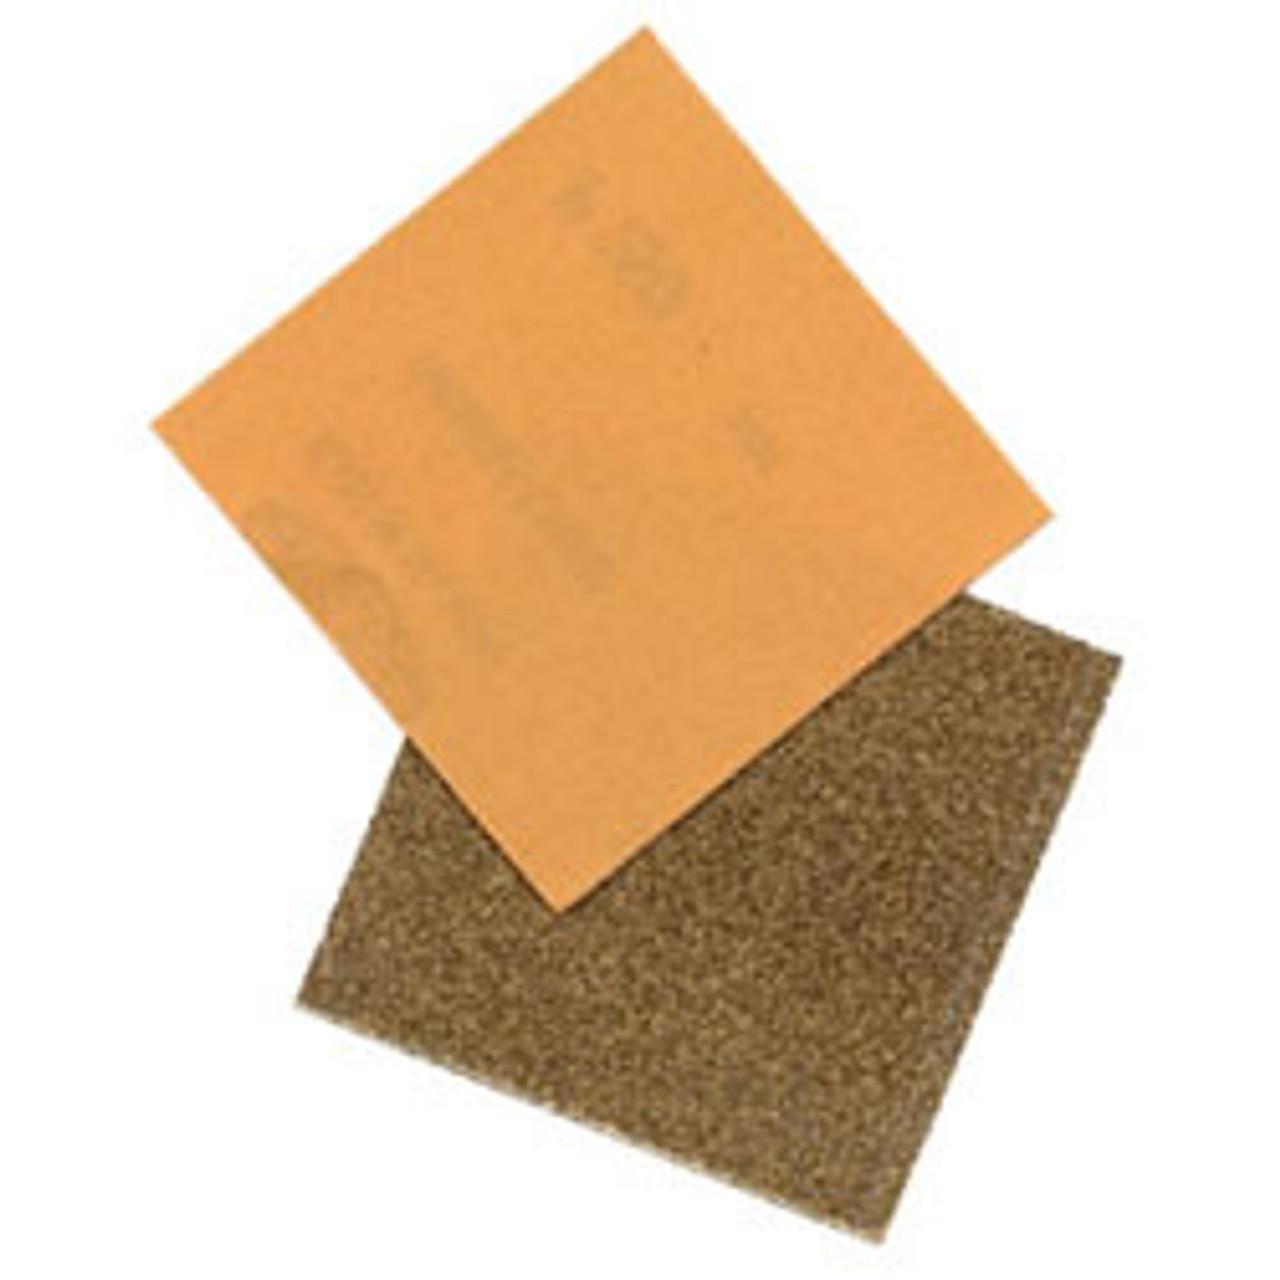 "Klingspor Abrasives Lightweight Aluminum Oxide, 4-1/2""x 4-1/2"" PSA 80 Grit, 5pk"